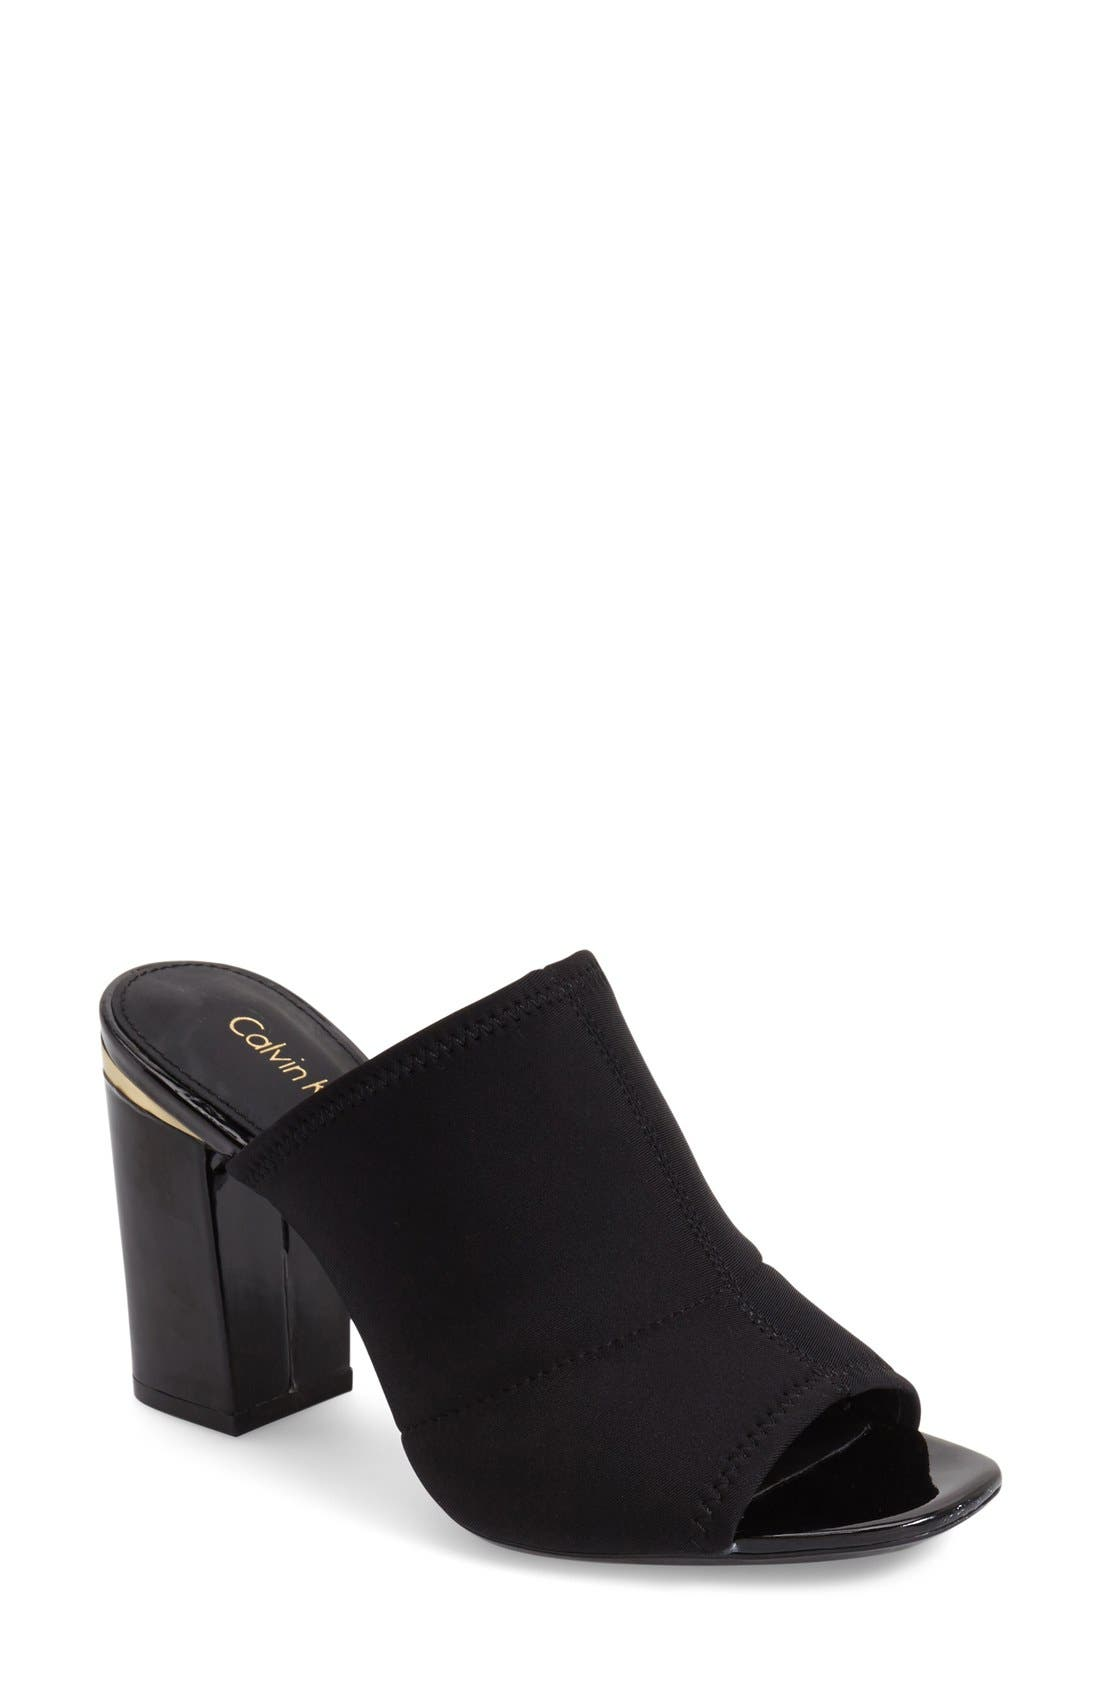 Alternate Image 1 Selected - Calvin Klein 'Cice' Mule Sandal (Women)